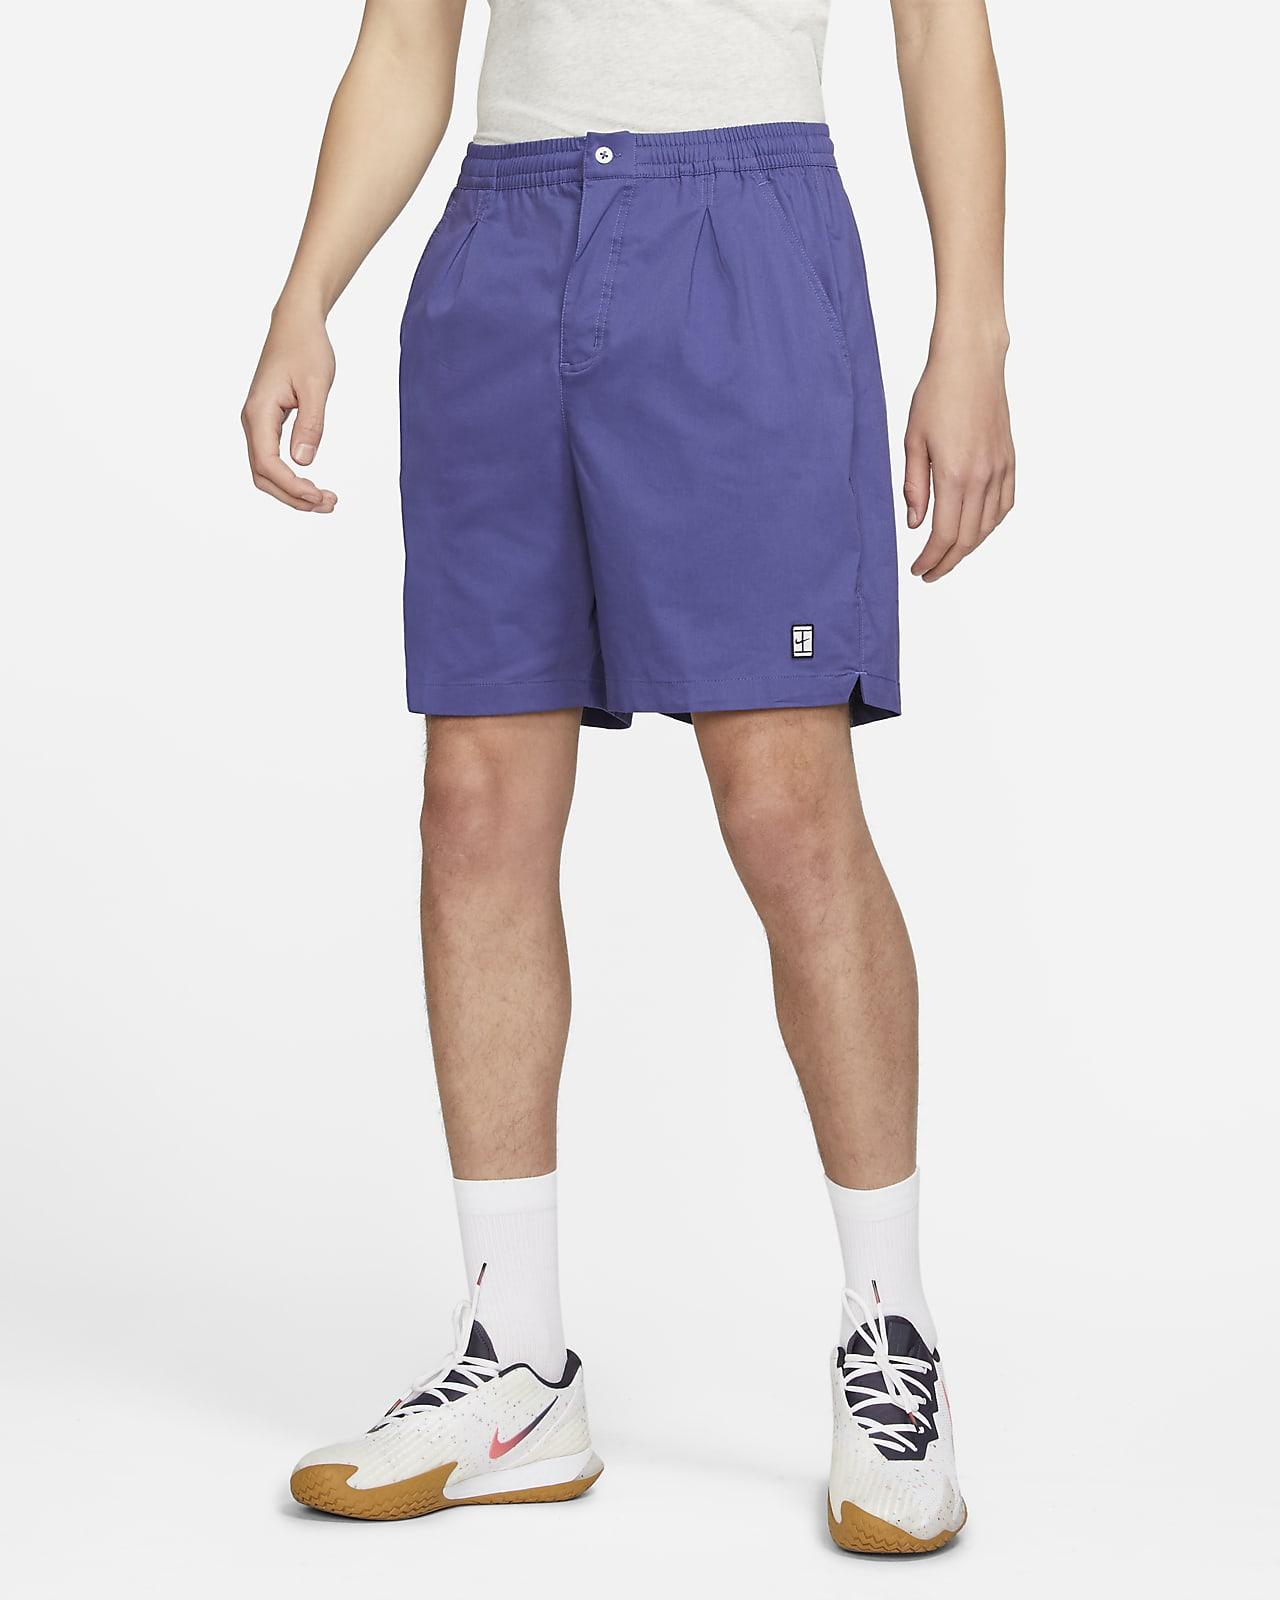 NikeCourt Men's Tennis Shorts